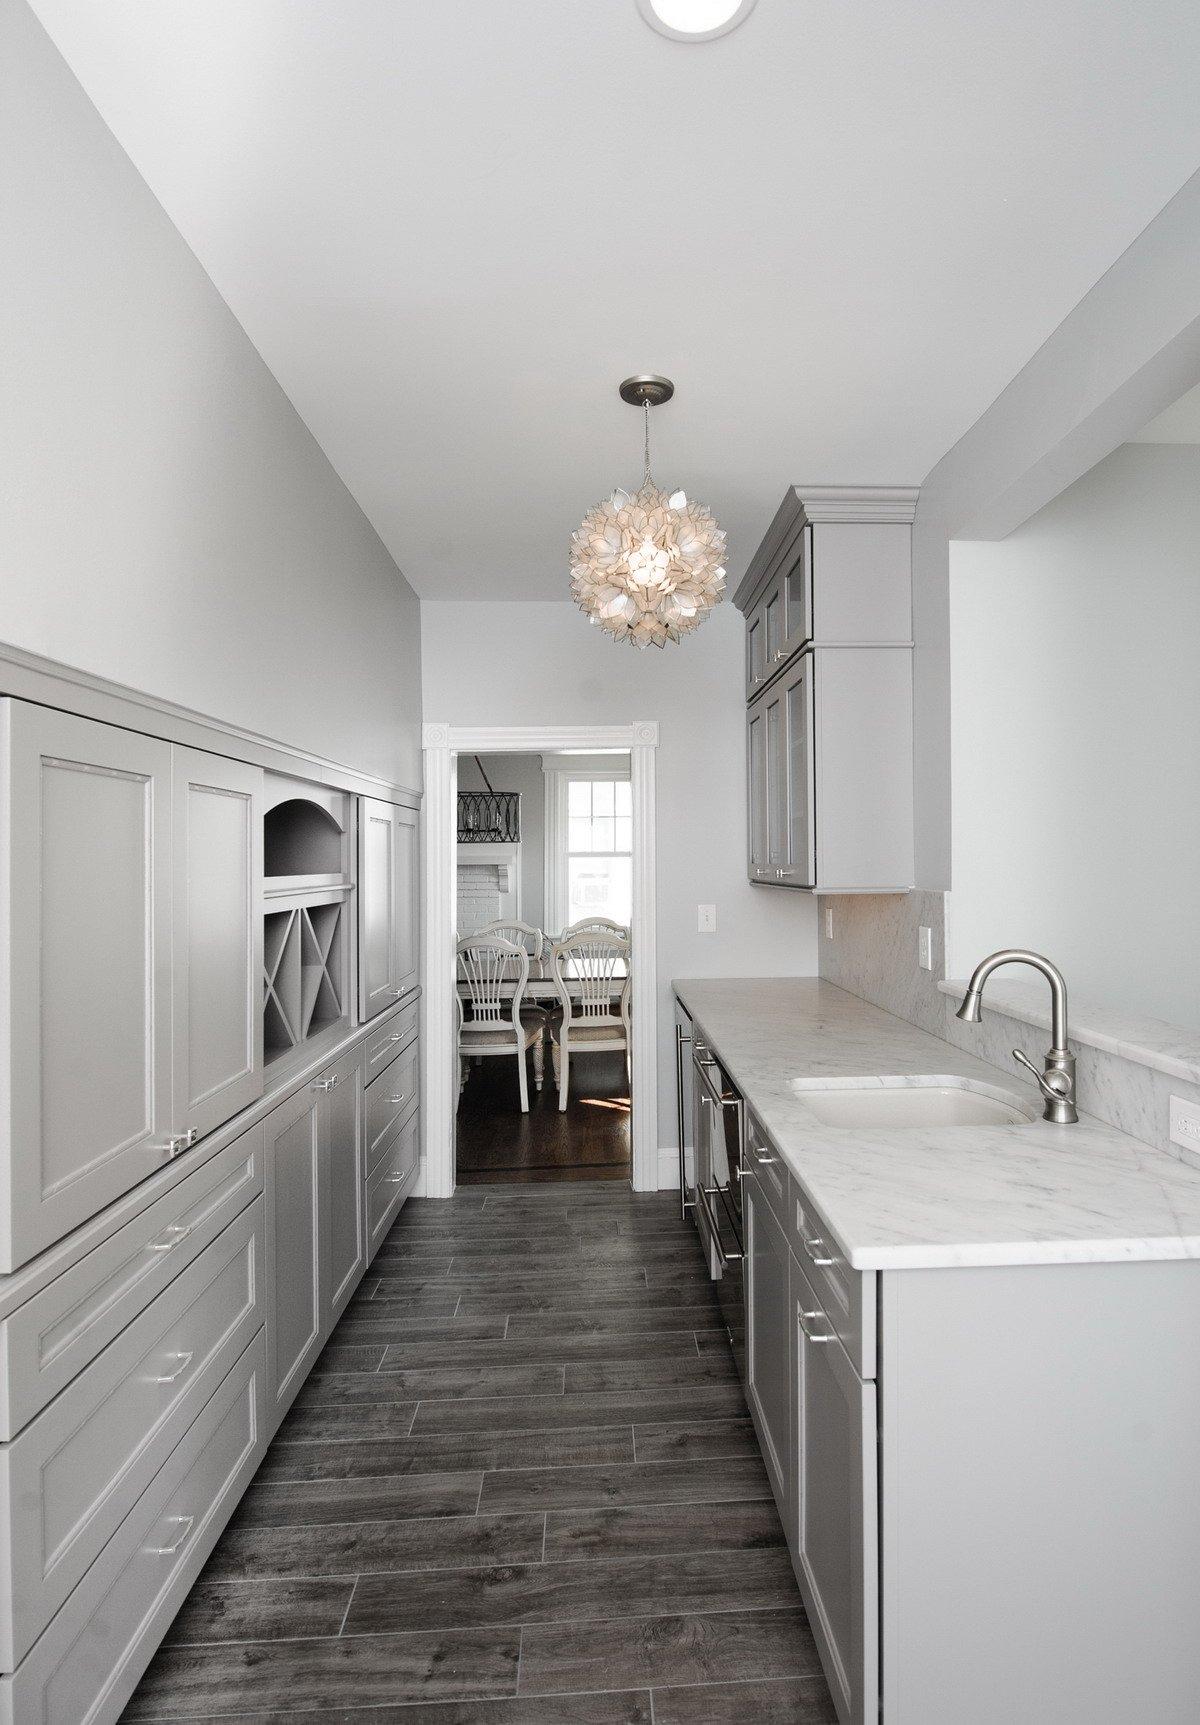 Kitchen Renovation in Ventnor, NJ – Under Construction Builders, LLC